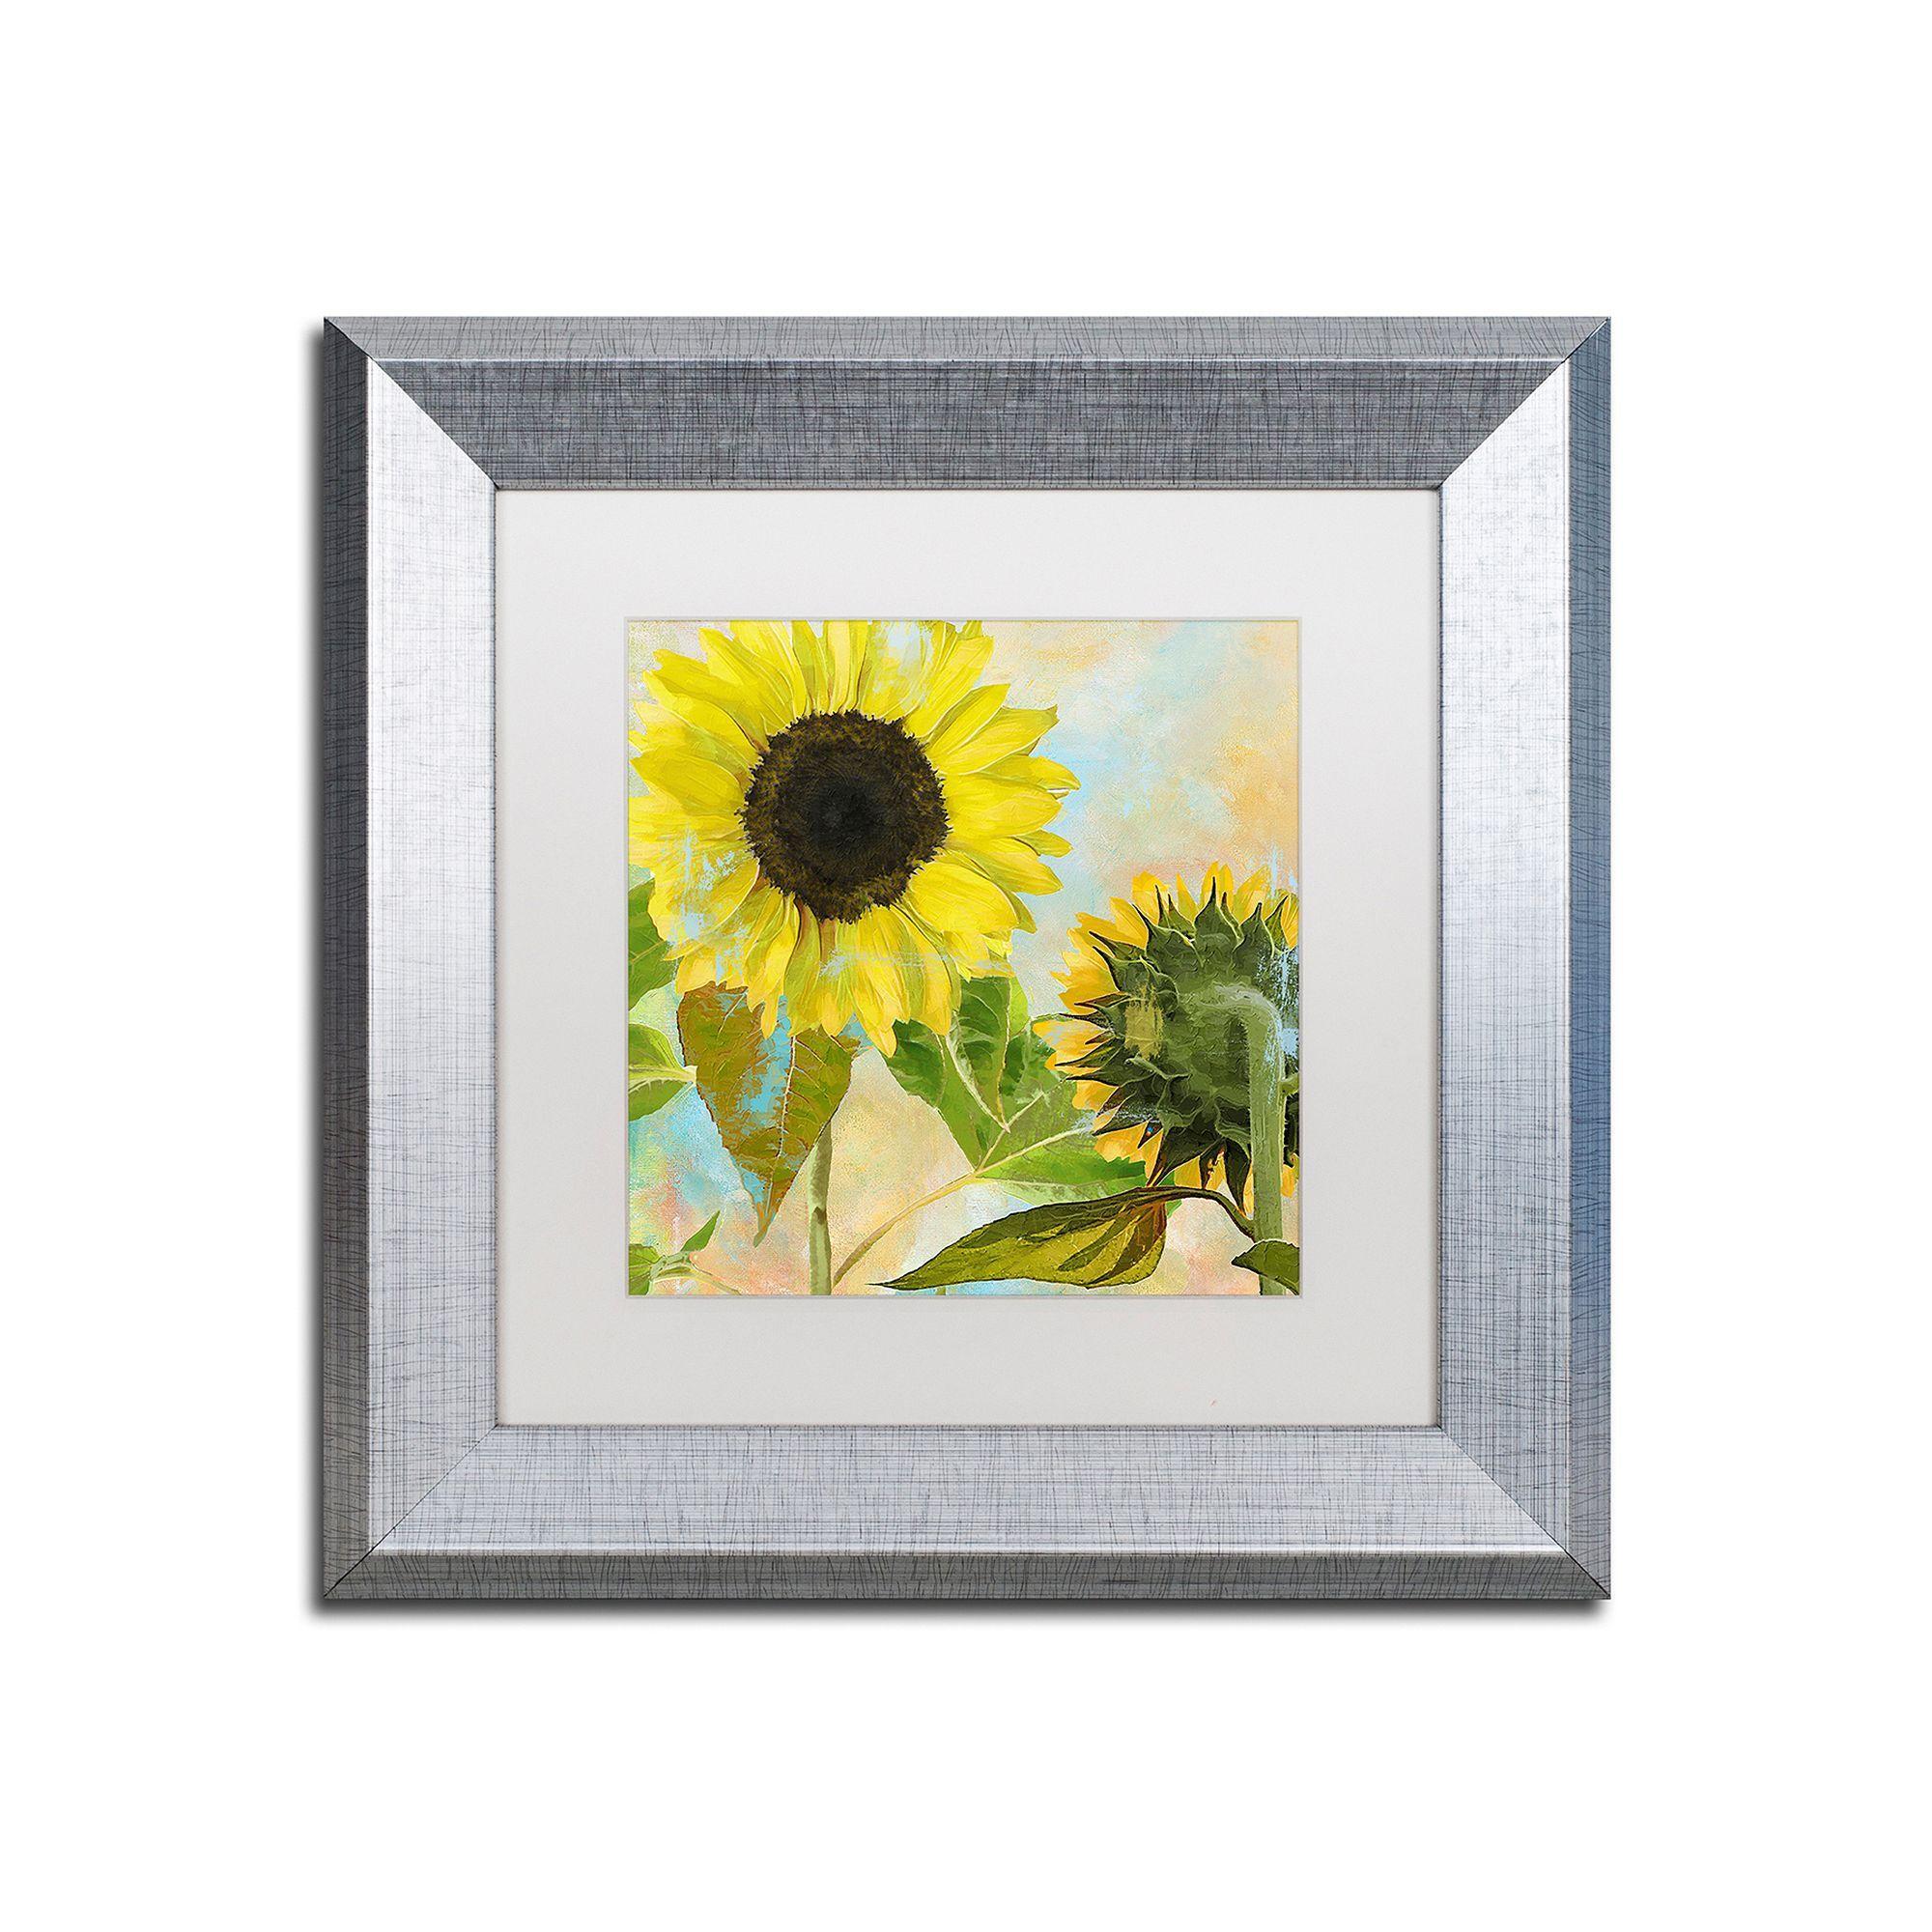 Trademark Fine Art Soleil I Silver Finish Framed Wall Art, Black ...